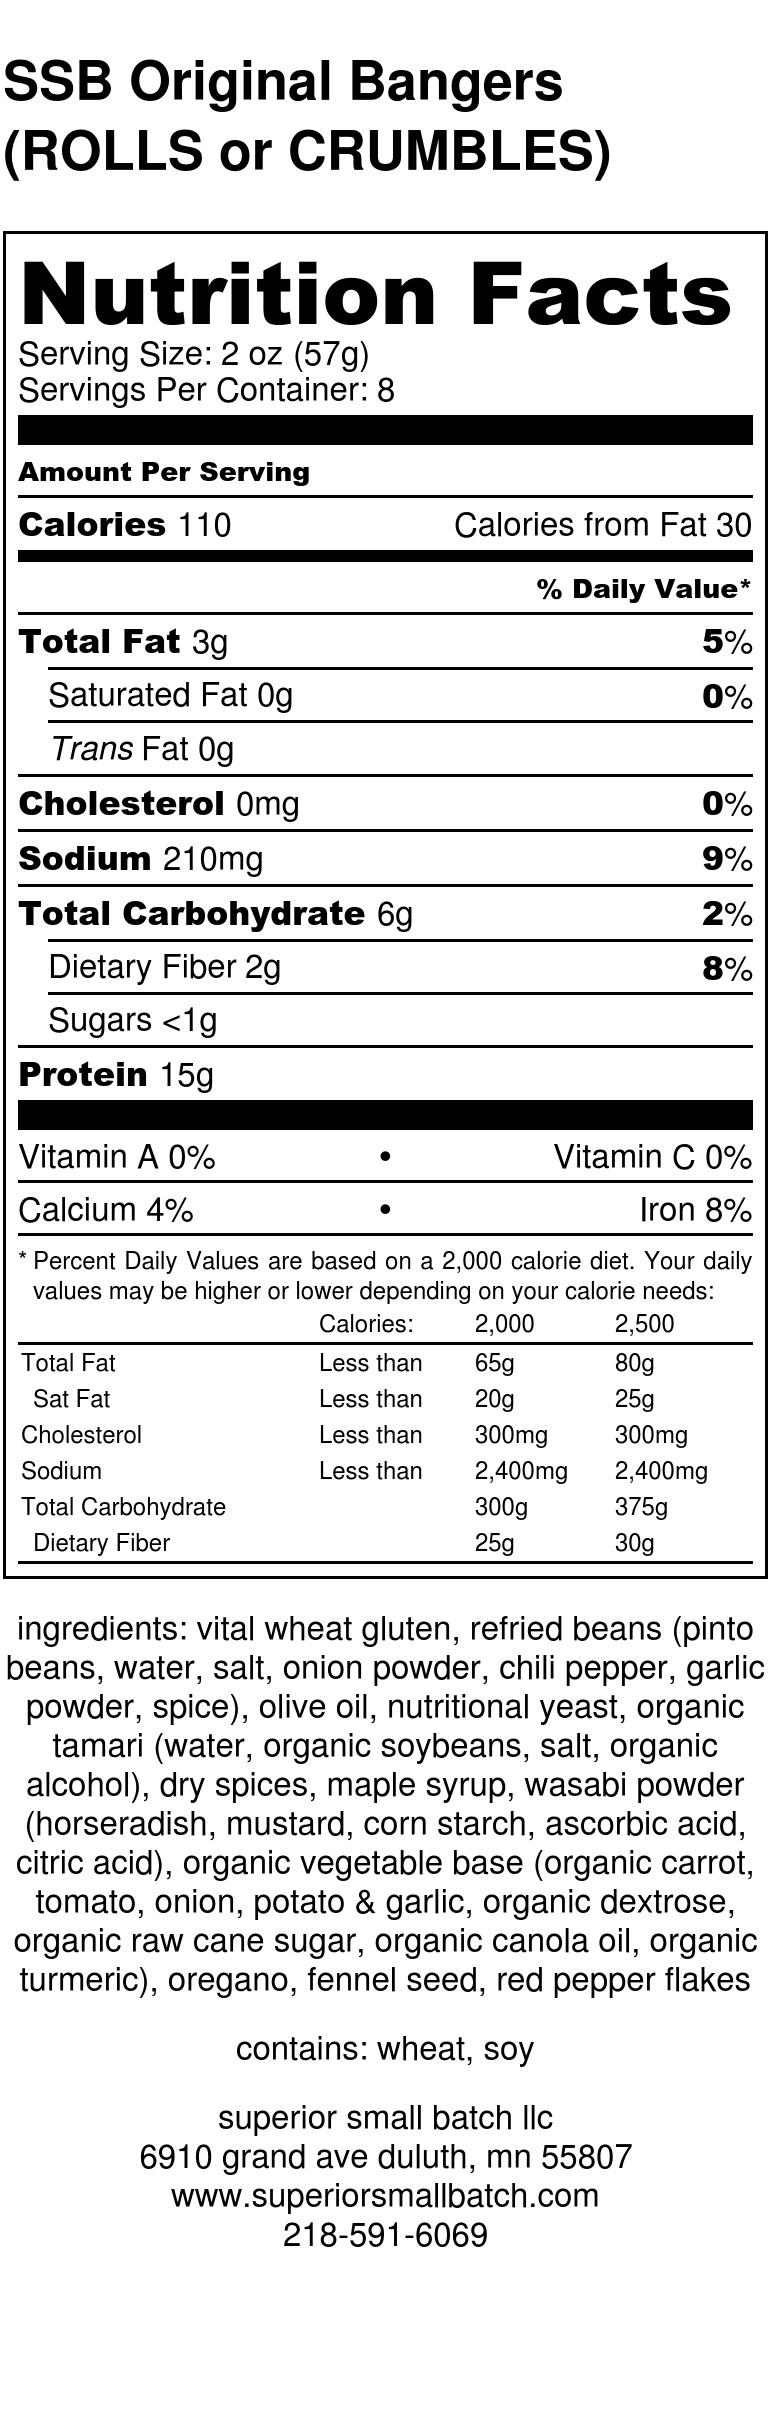 SSB Original Bangers (ROLLS or CRUMBLES) - Nutrition Label.jpg